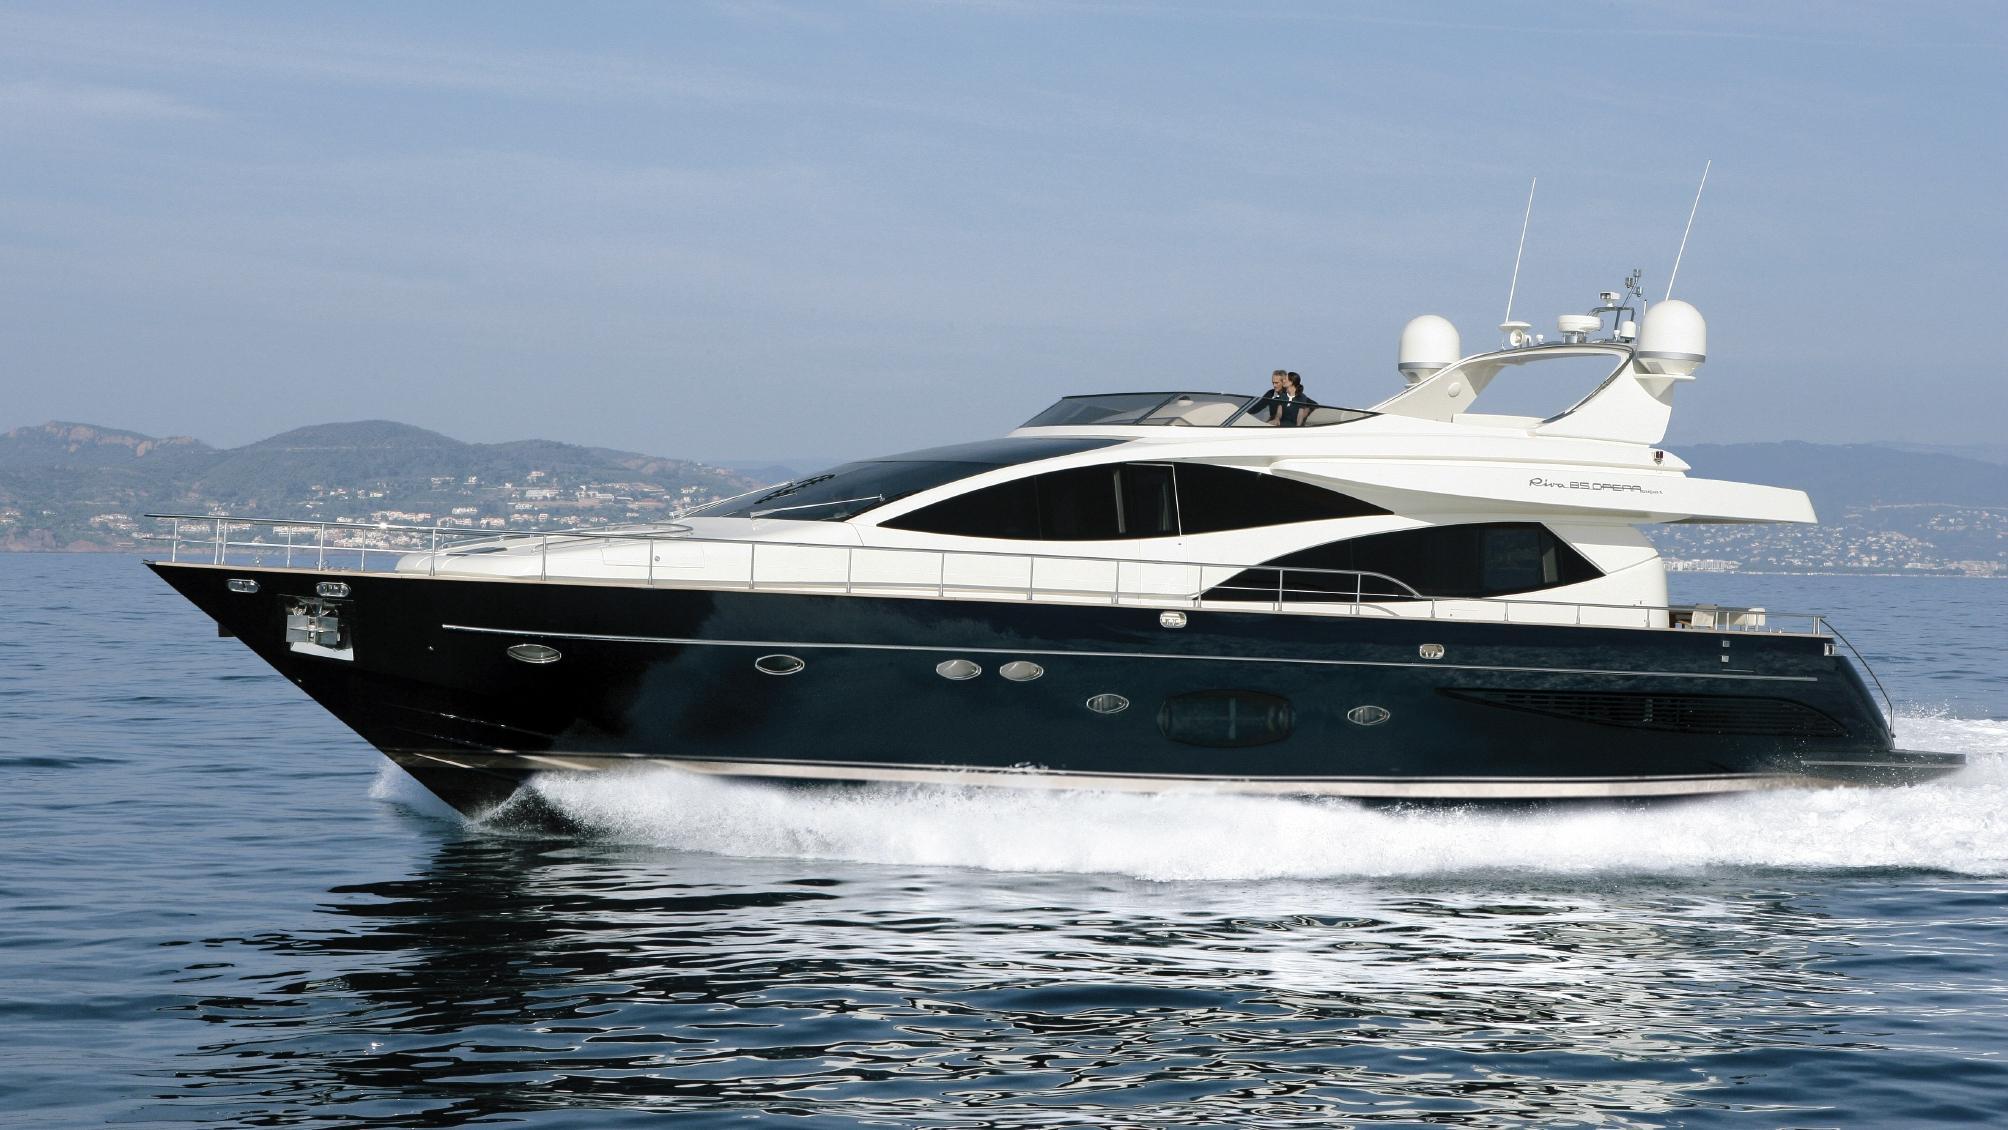 riva-opera-85-11-motor-yacht-2006-26m-cruising